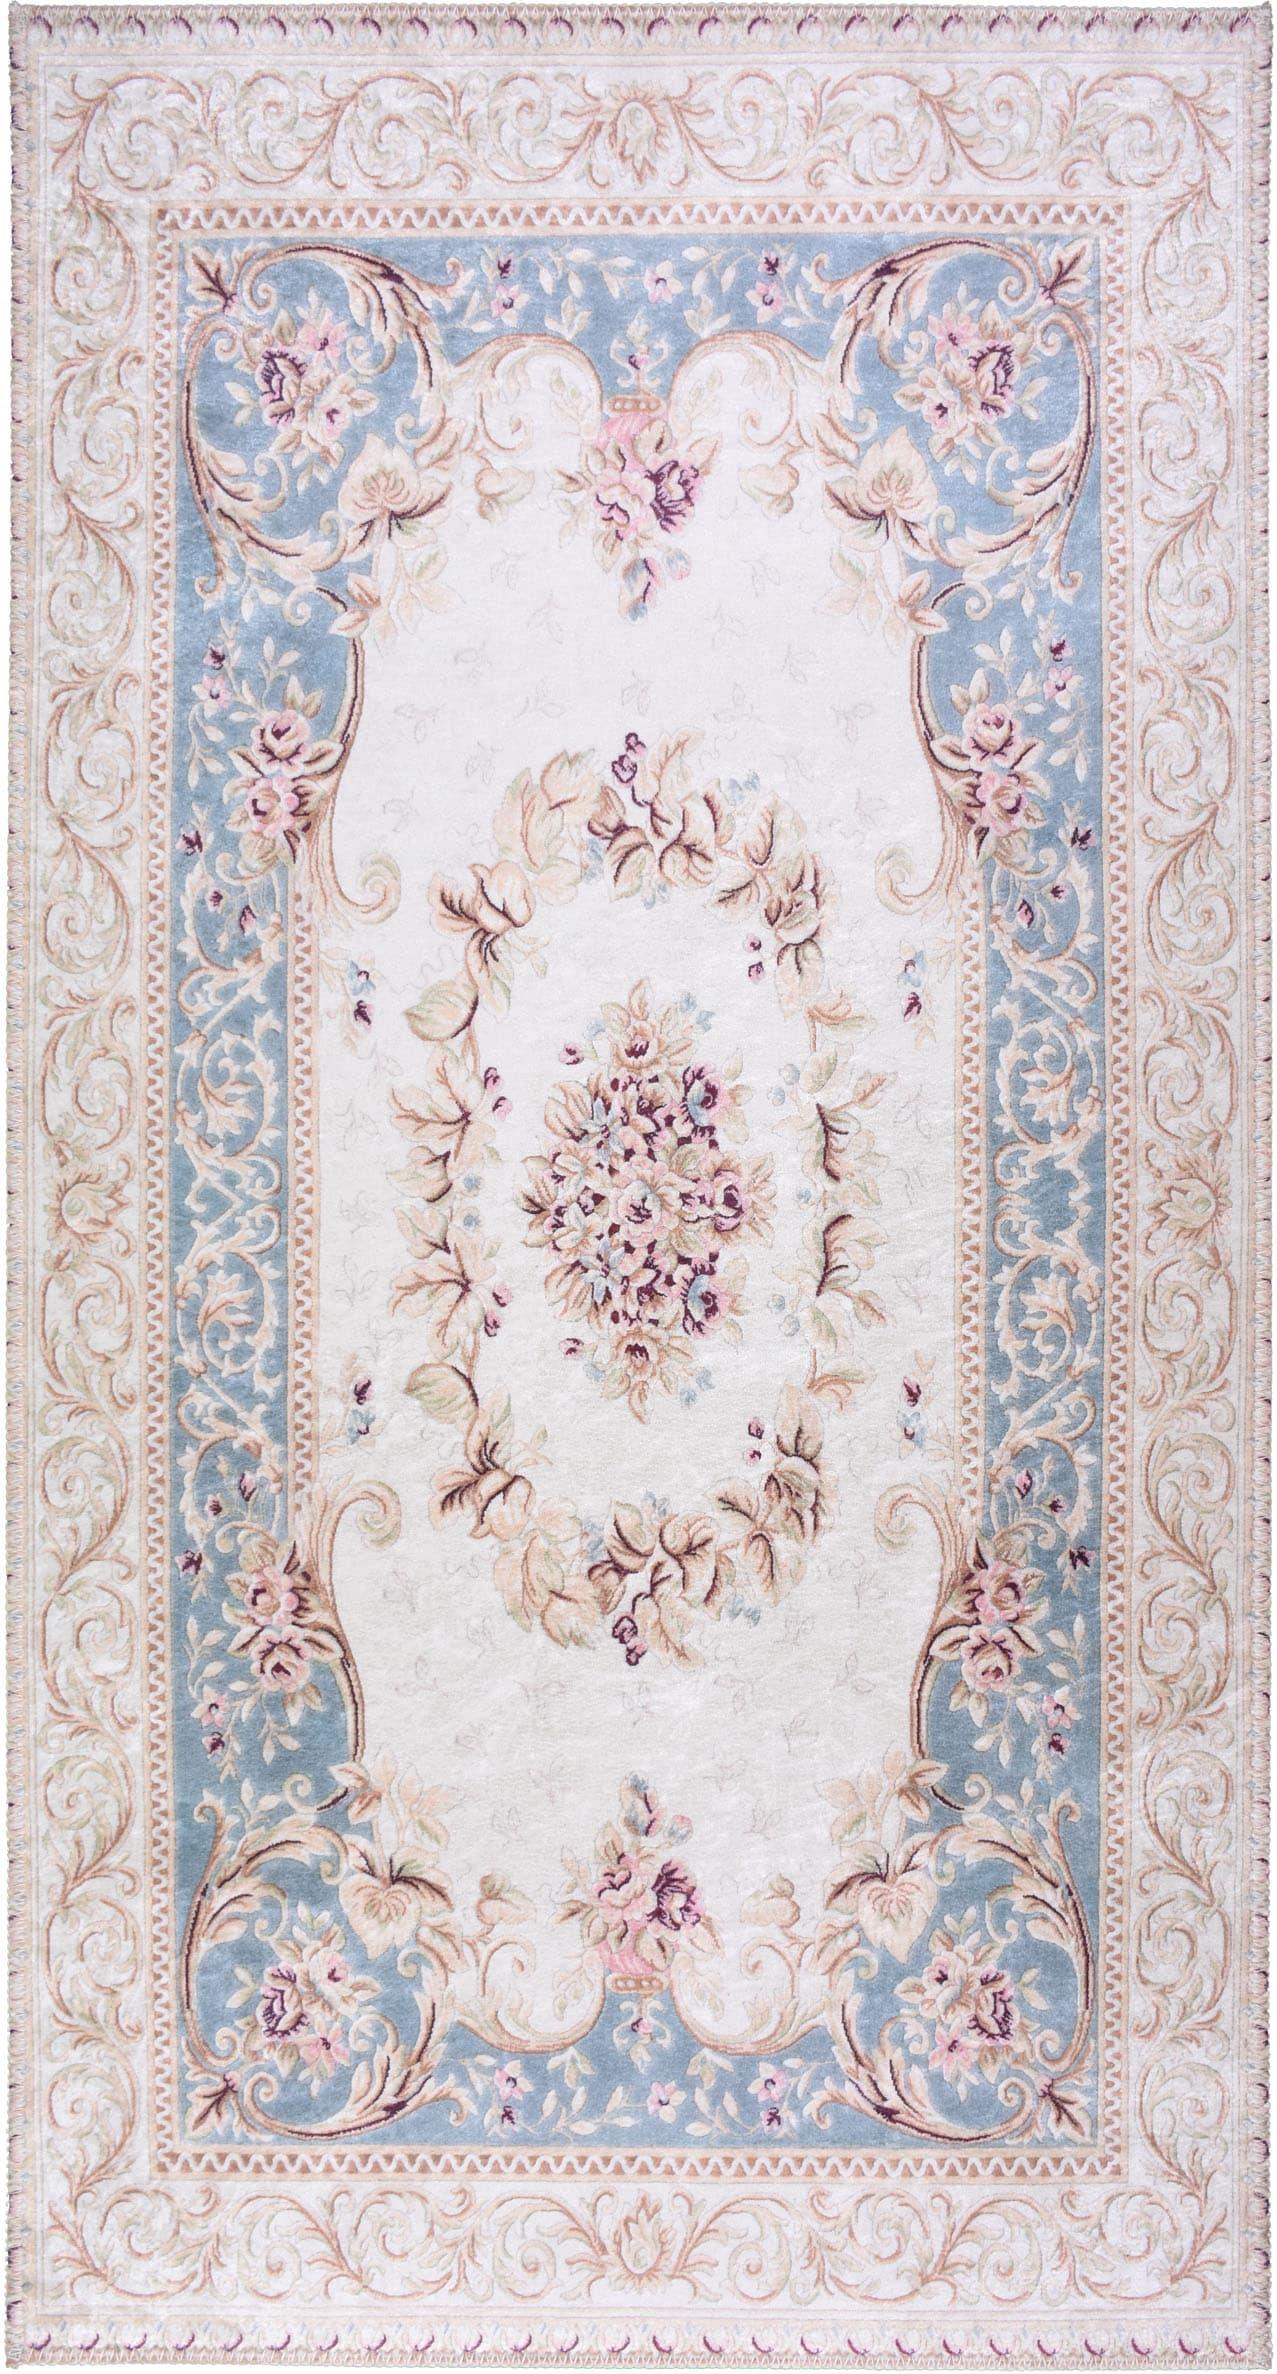 Covor Elegance 1481 Multicolor, 160 x 230 cm poza